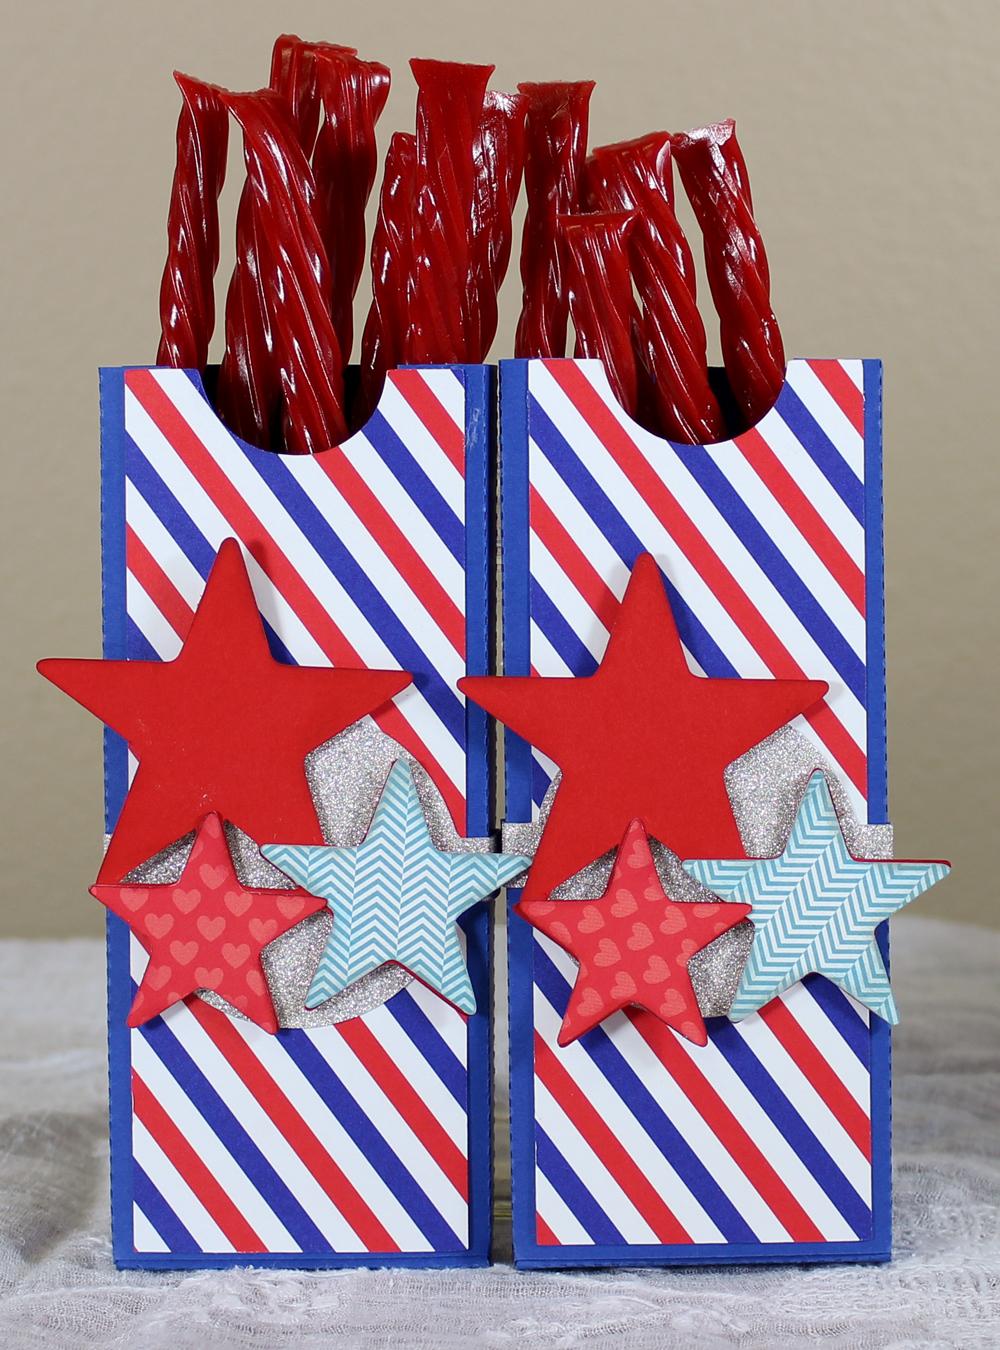 Patriotic-Party-Supplies-Sparkler-Box